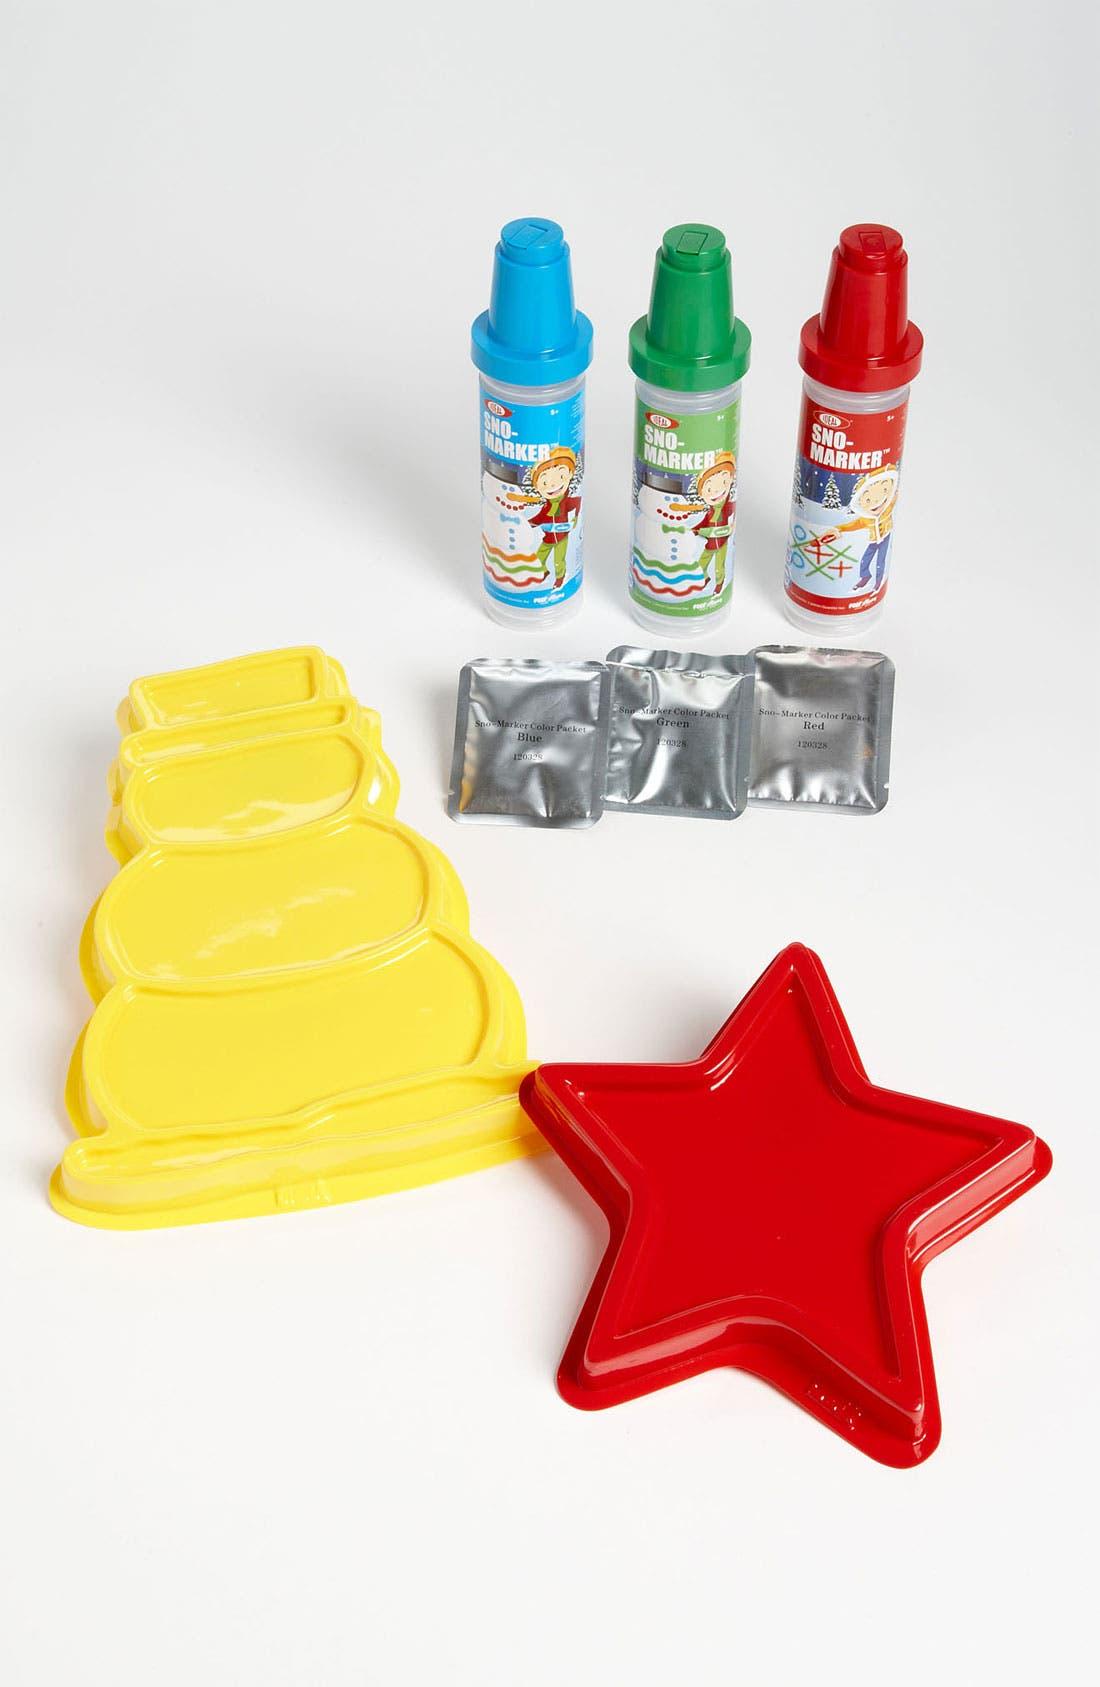 Alternate Image 1 Selected - Poof-Slinky Snow Art Kit